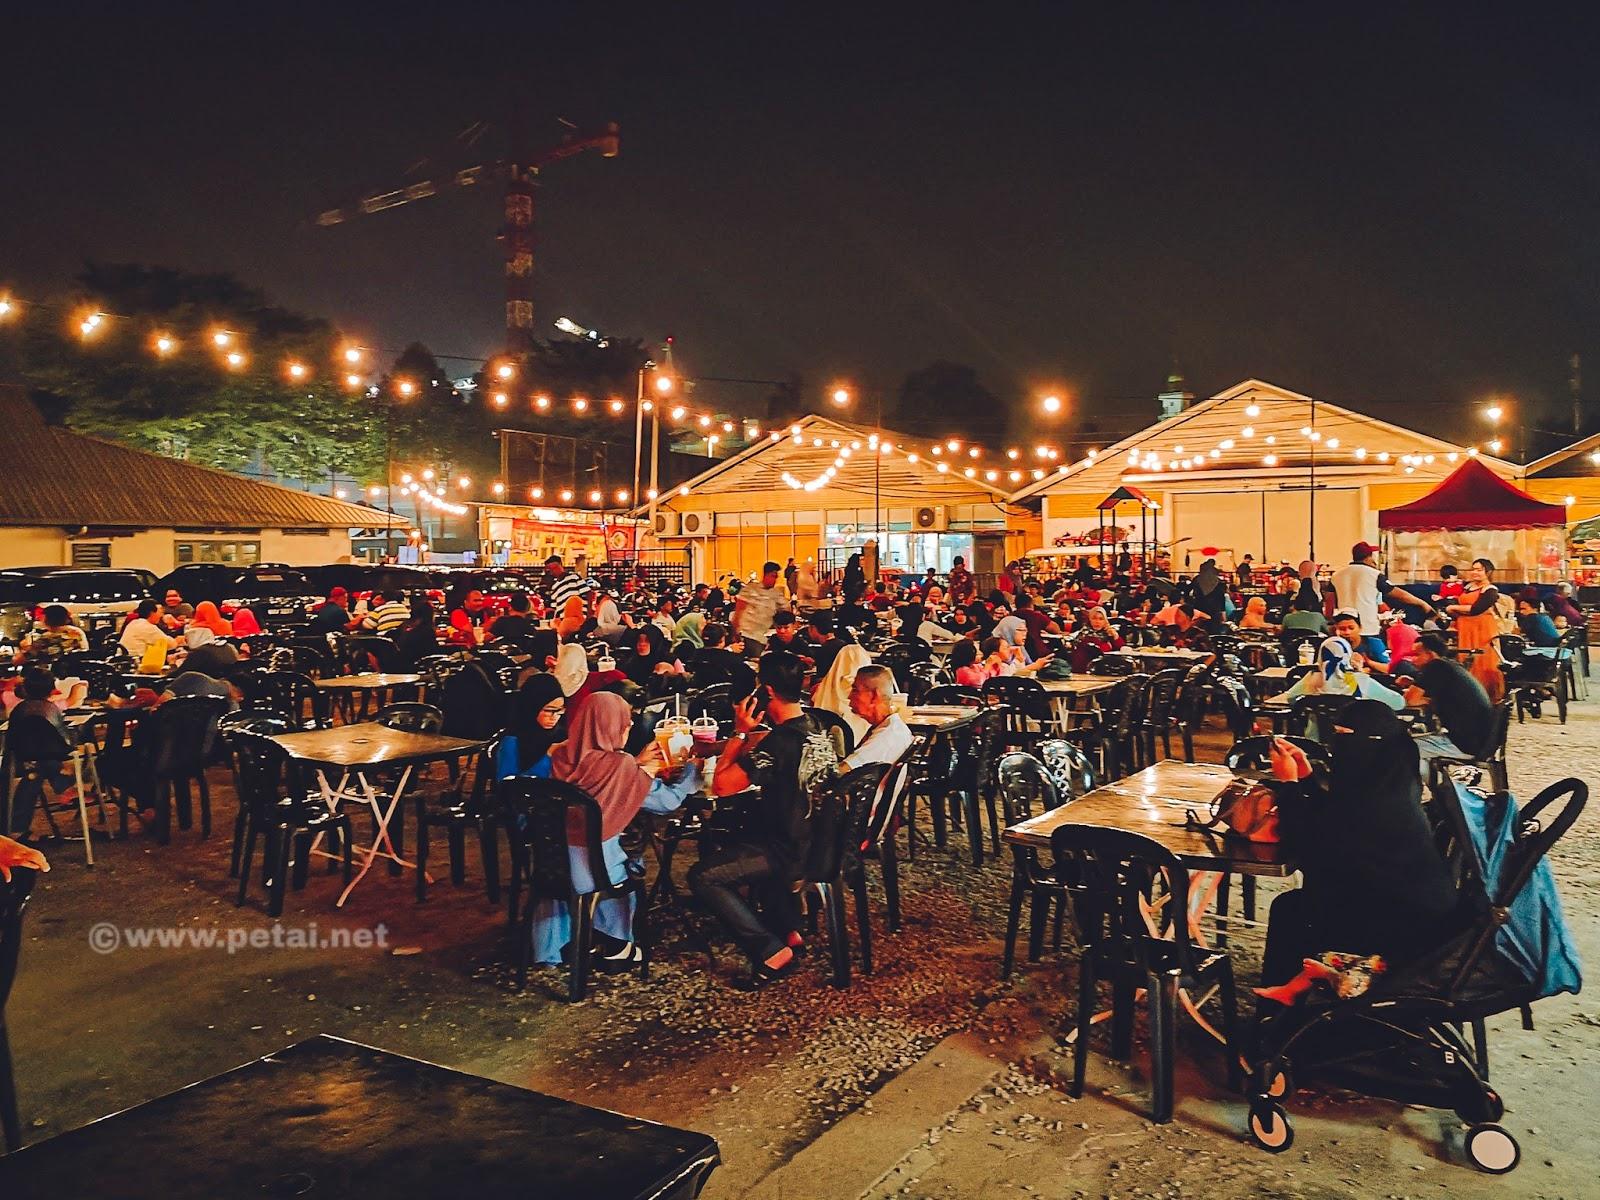 Kantin @ Setor Gombak - ruang makan